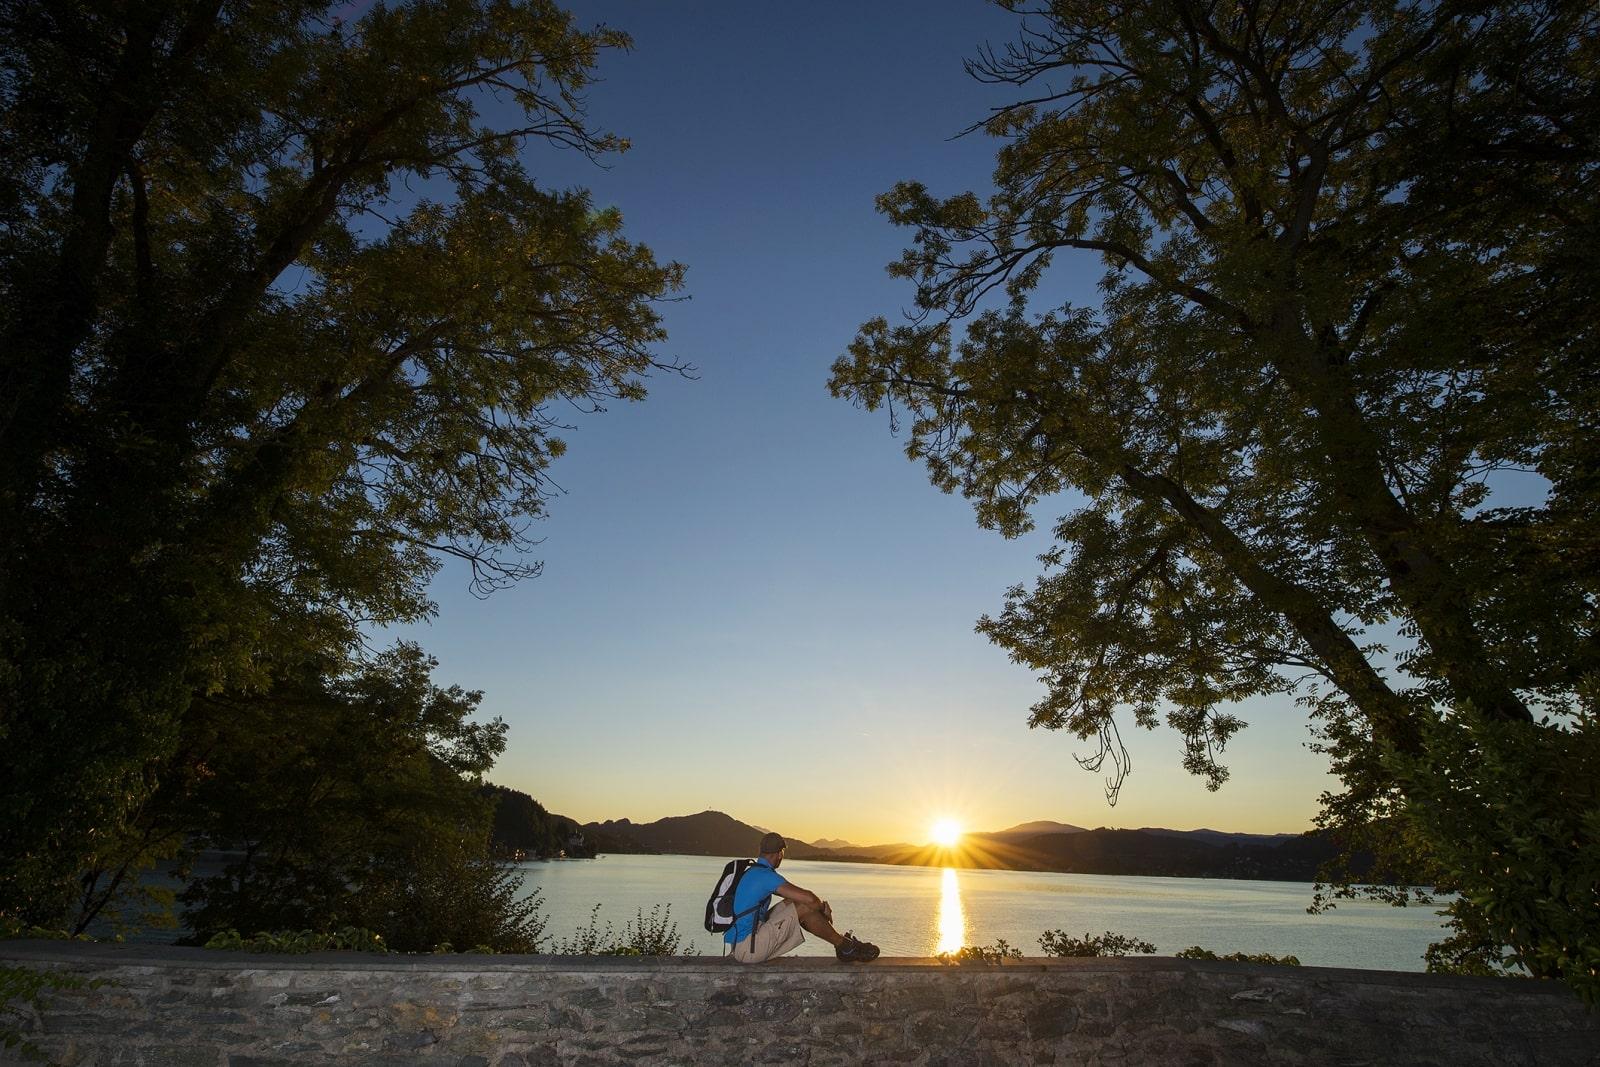 Heidi-Chalet-Falkert-Heidialm-Natur-See-Baden-Relaxen-Baum-Abendstimmung